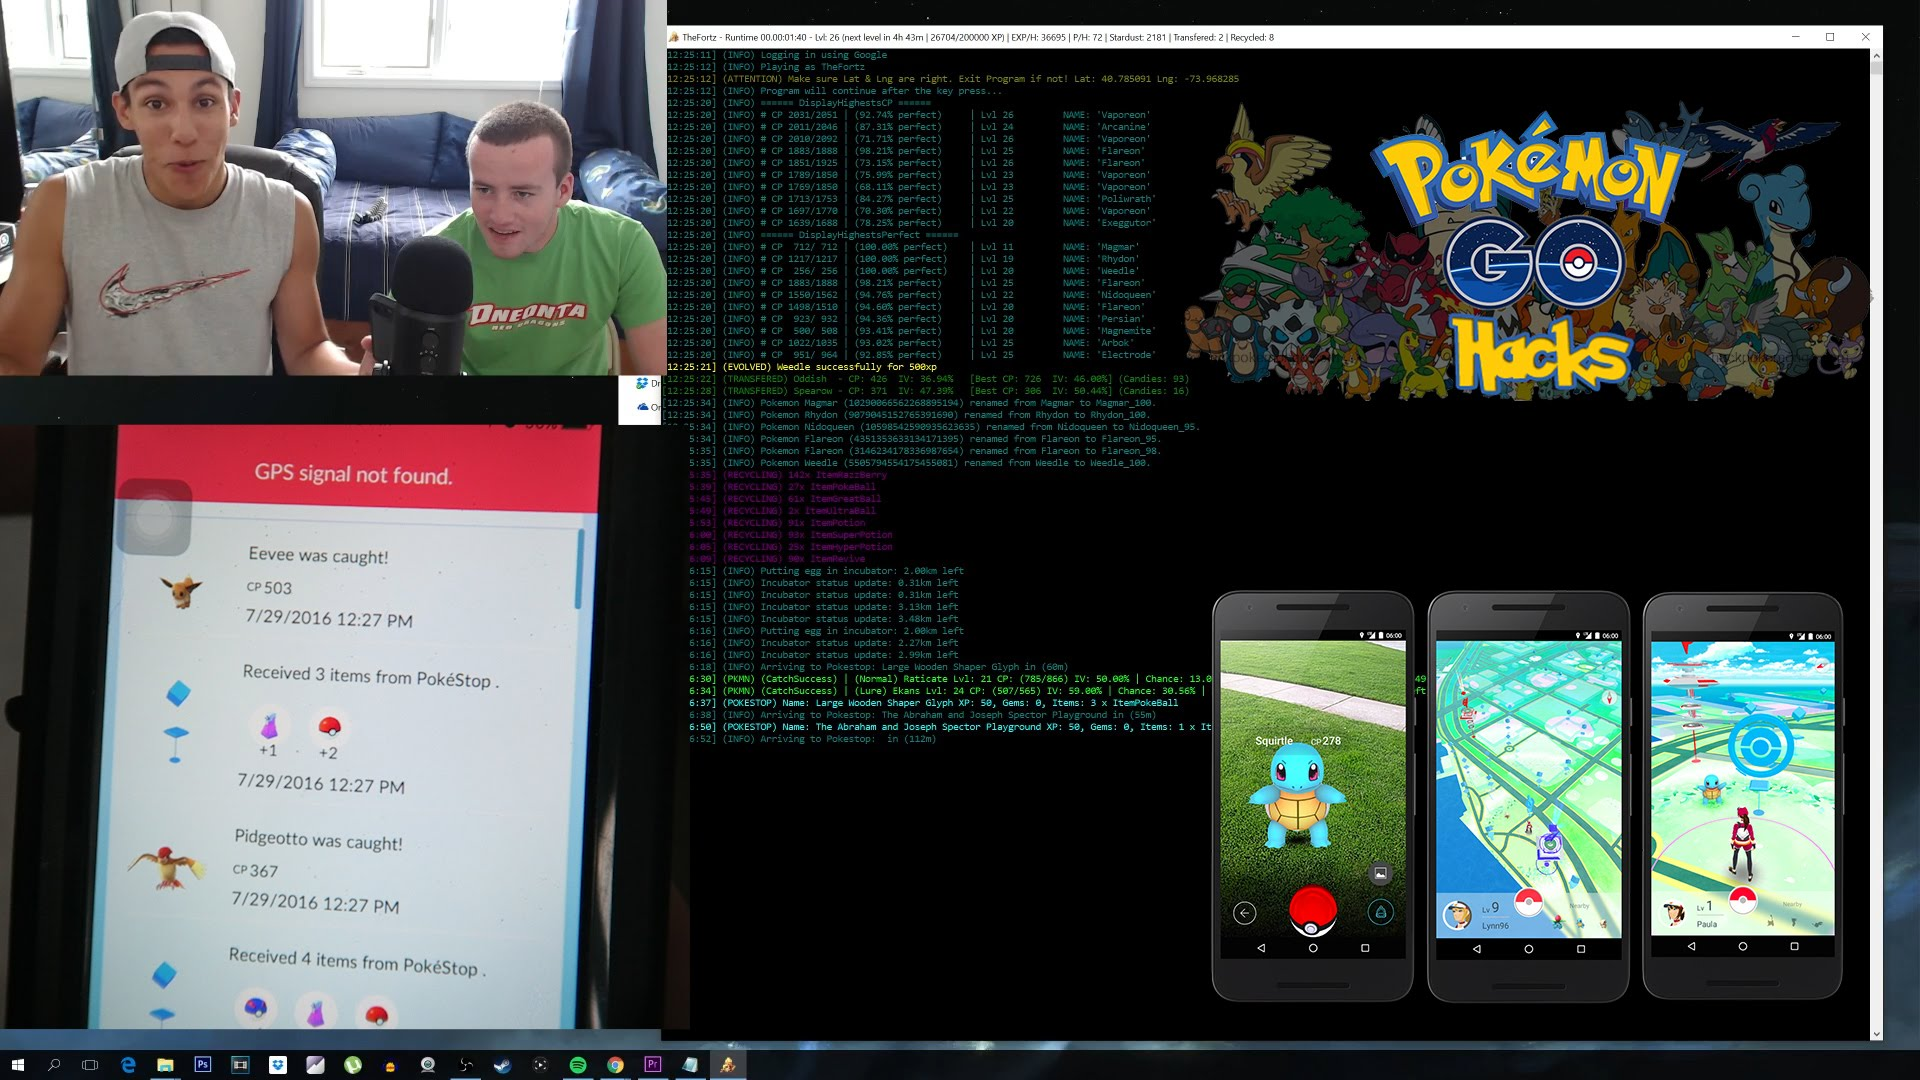 Come scaricare NecroBot da Pokemon Go? 1